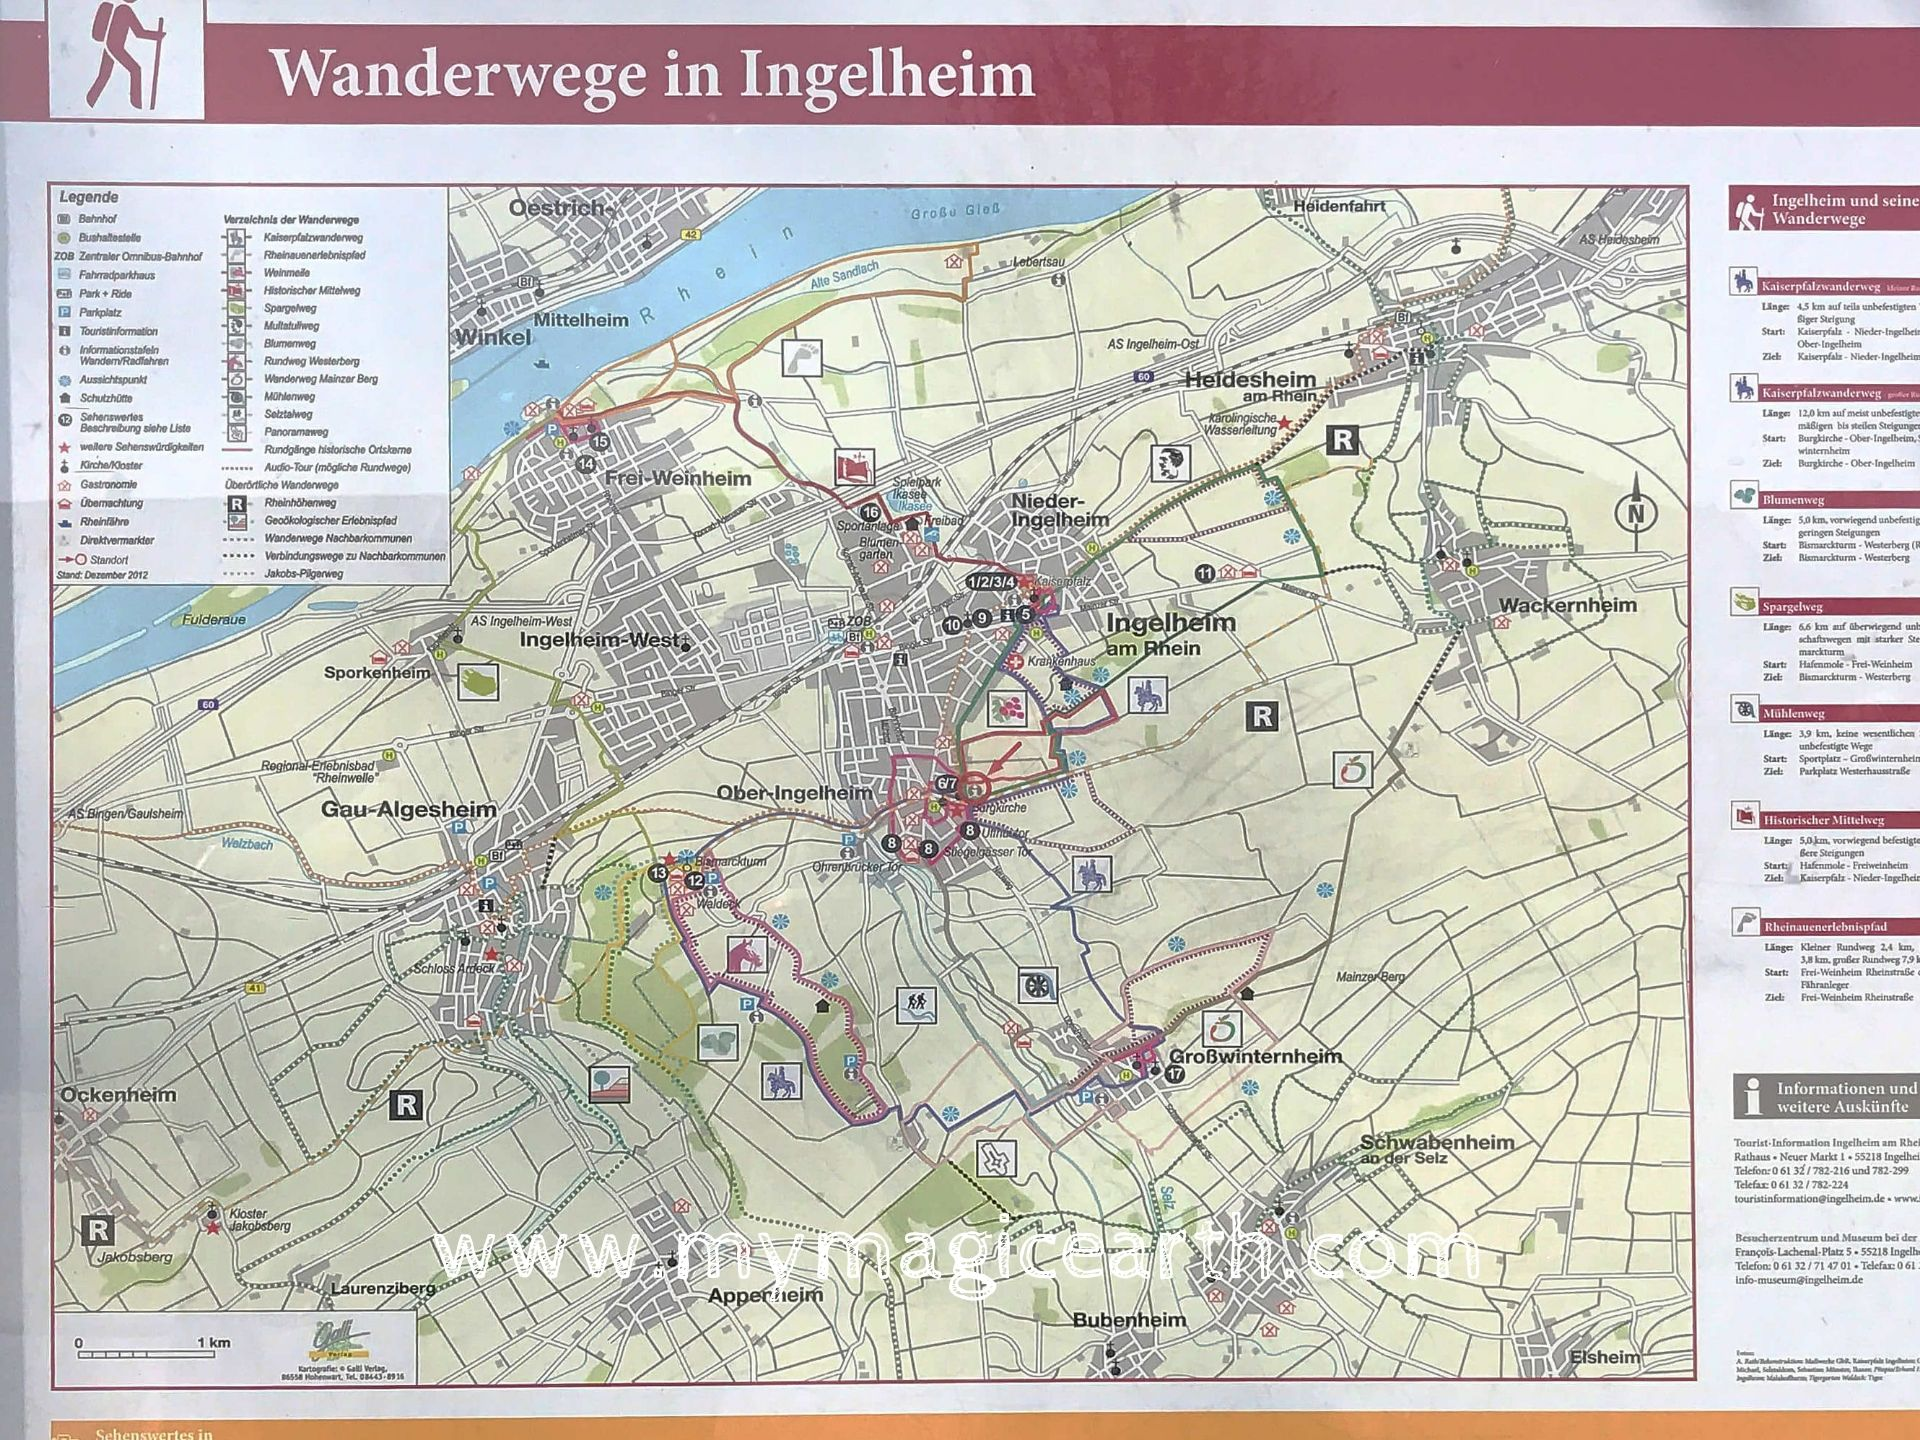 Hiking trails in Ingelheim, Cycling trail in Ingelheim, Rhine River, Germany